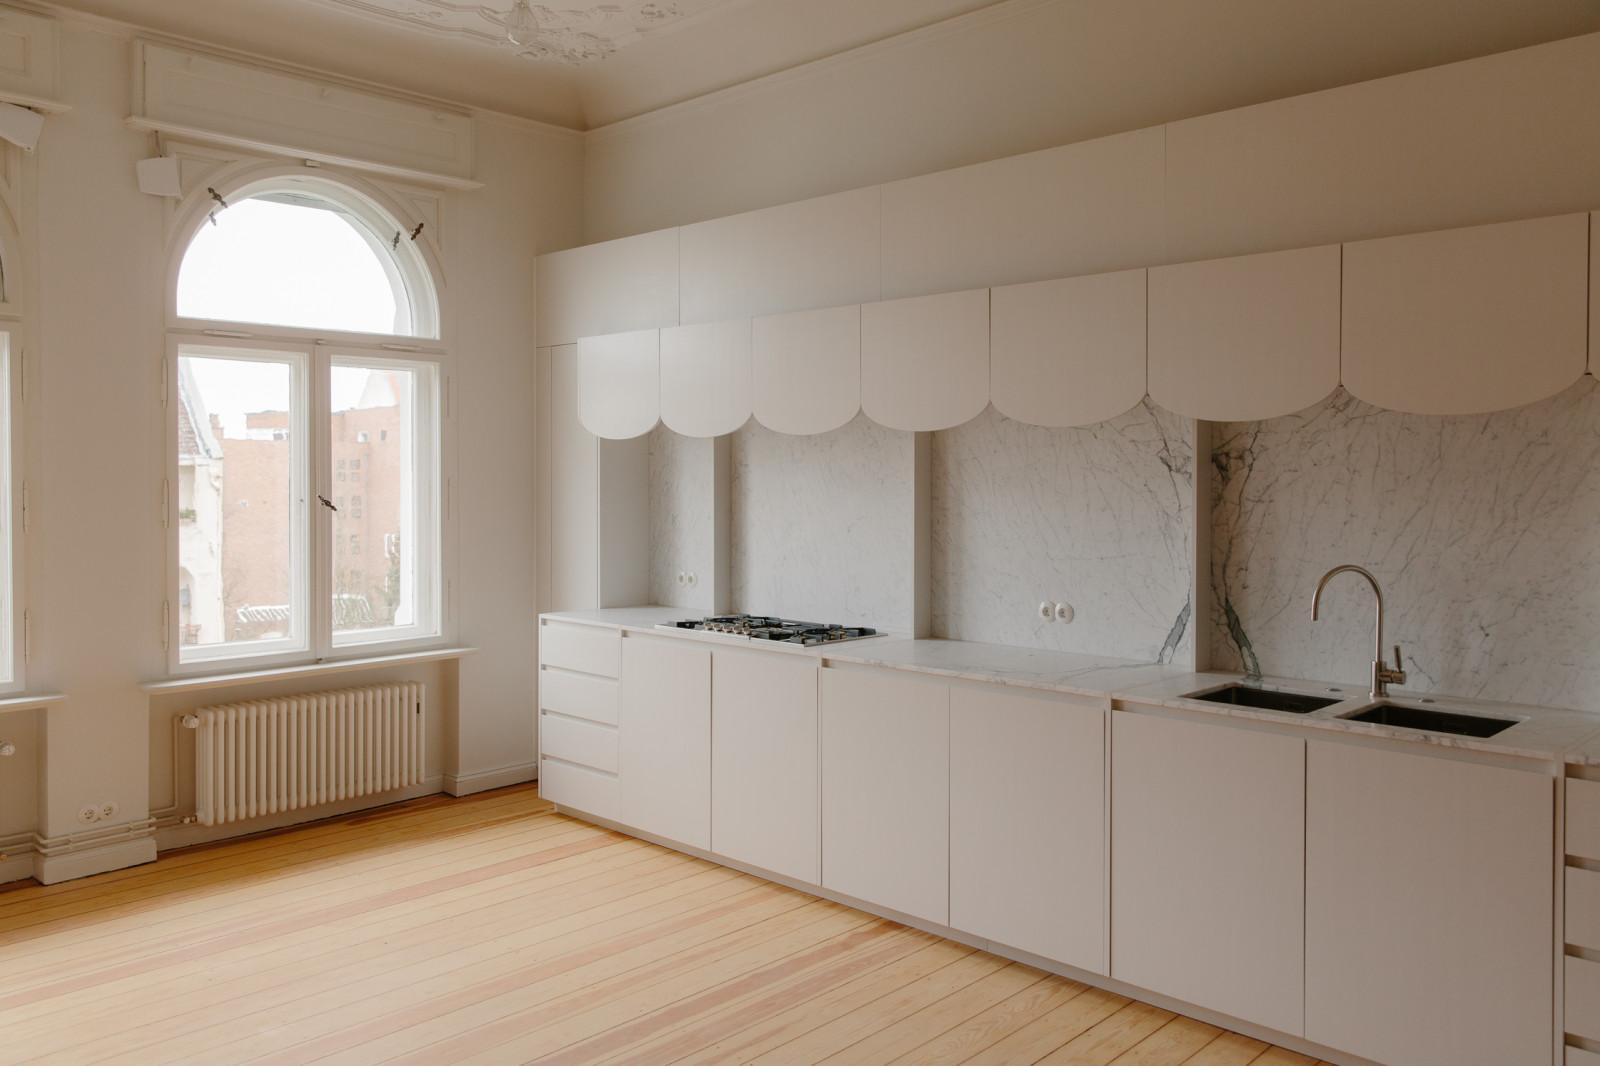 Kitchen (private apartment), Berlin 2016 Photo: Felix Brüggemann